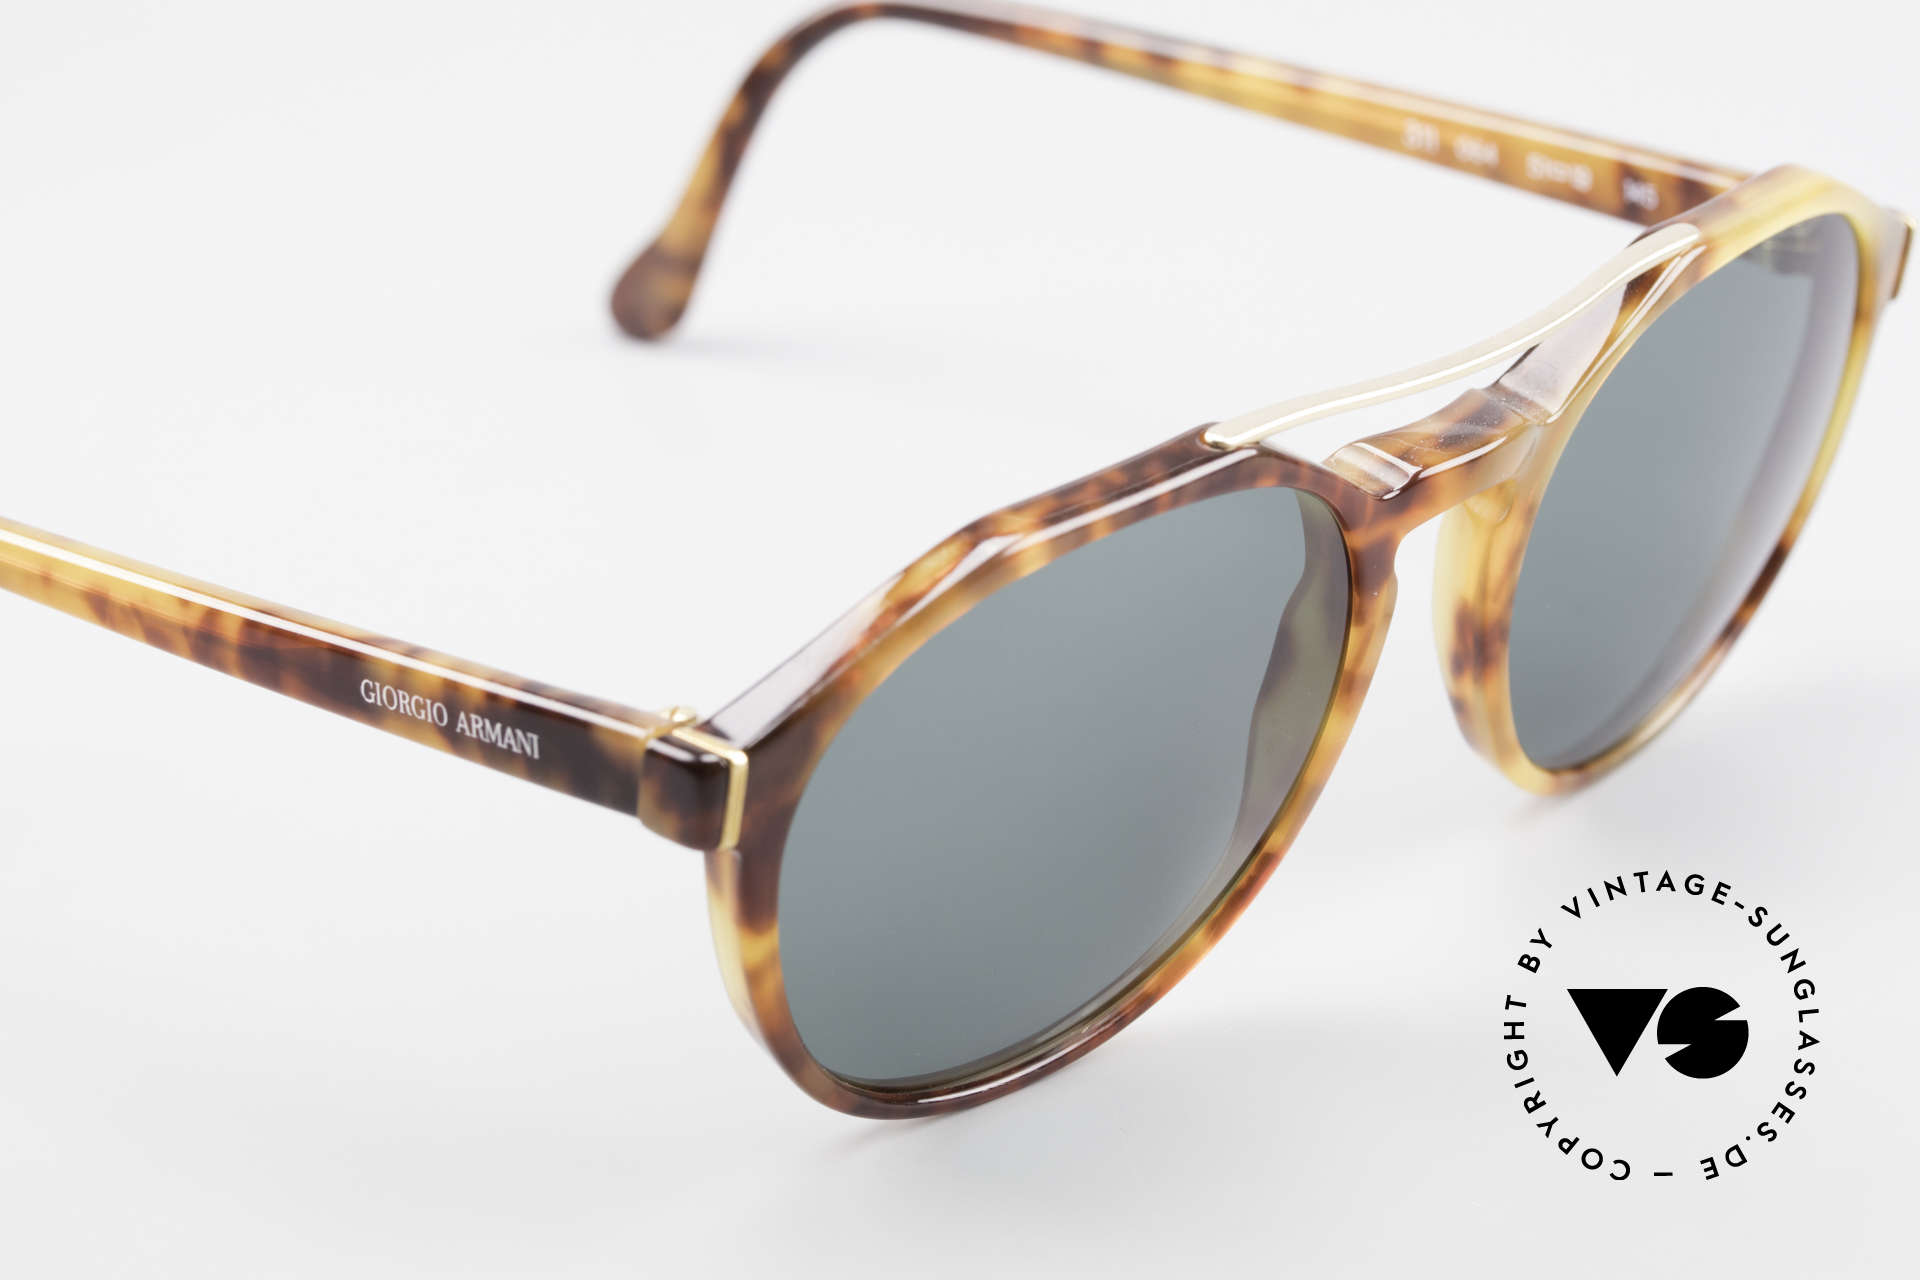 Giorgio Armani 311 Round Aviator 80s Sunglasses, NO RETRO sunnies, but a unique 30 years old ORIGINAL!, Made for Men and Women